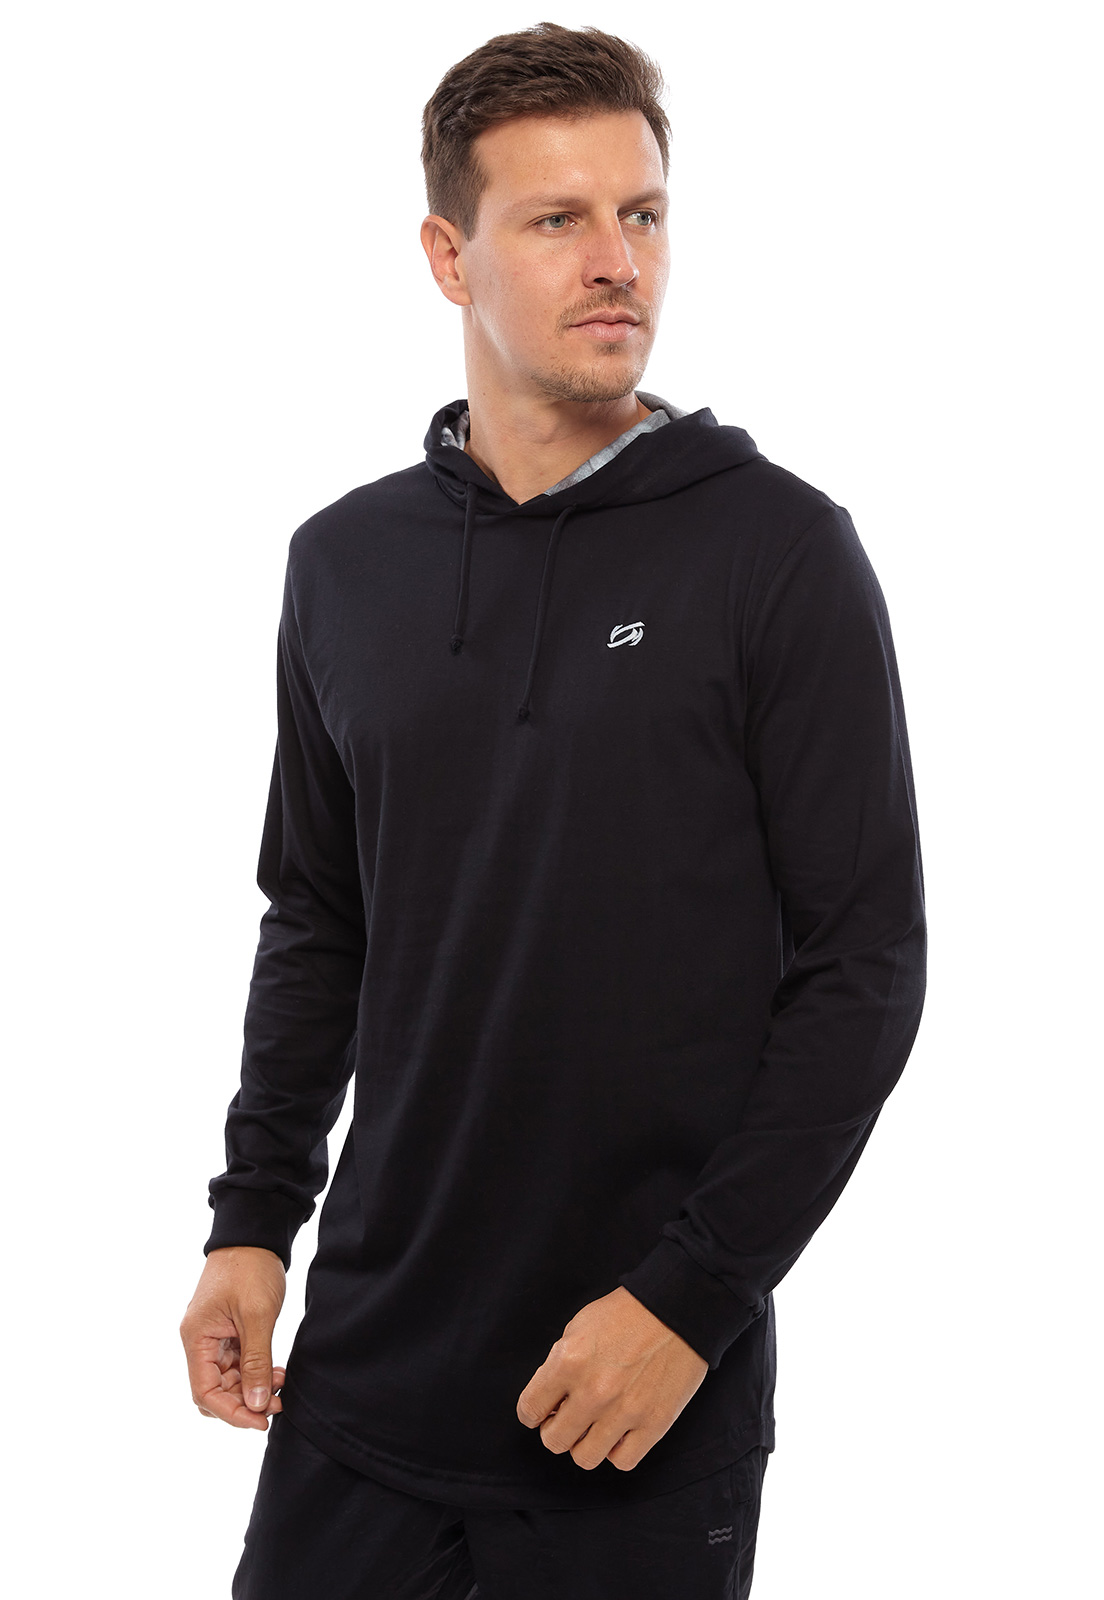 Camiseta Vida Marinha Manga Longa Preta com Capuz